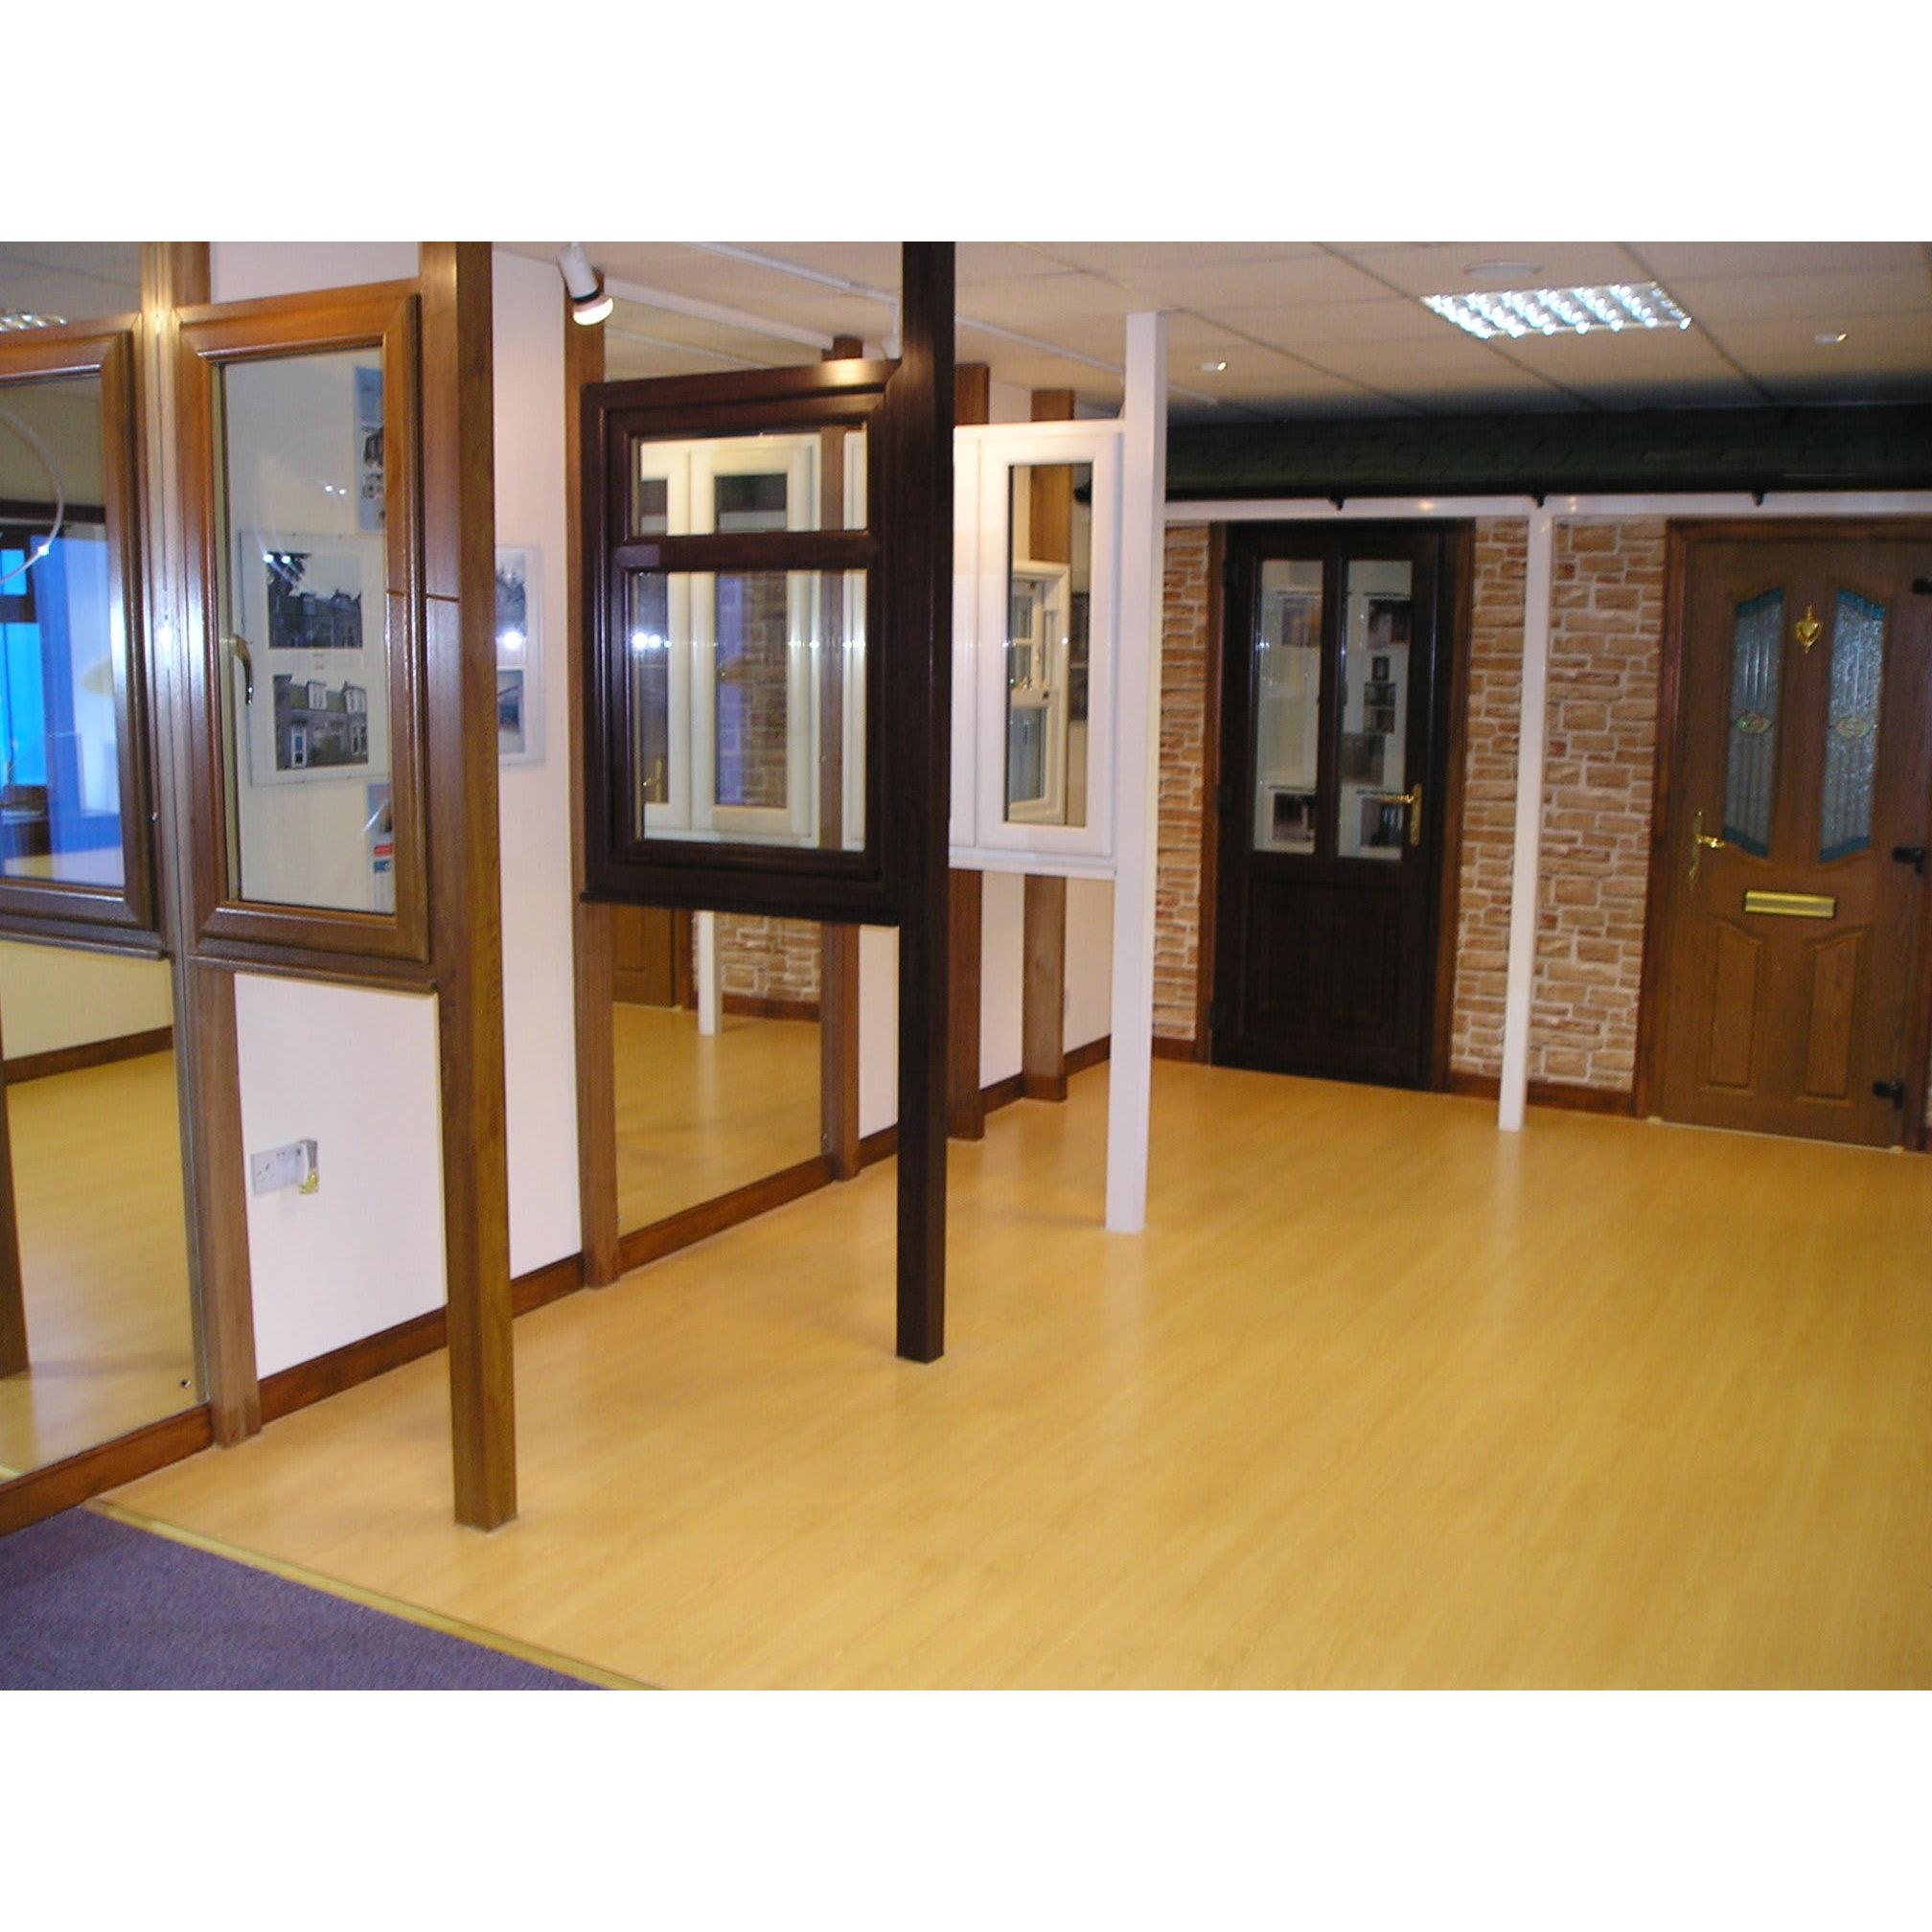 M.T.C Property Development Co.Ltd - Aberdeen, Aberdeenshire AB25 3TU - 01224 643011   ShowMeLocal.com